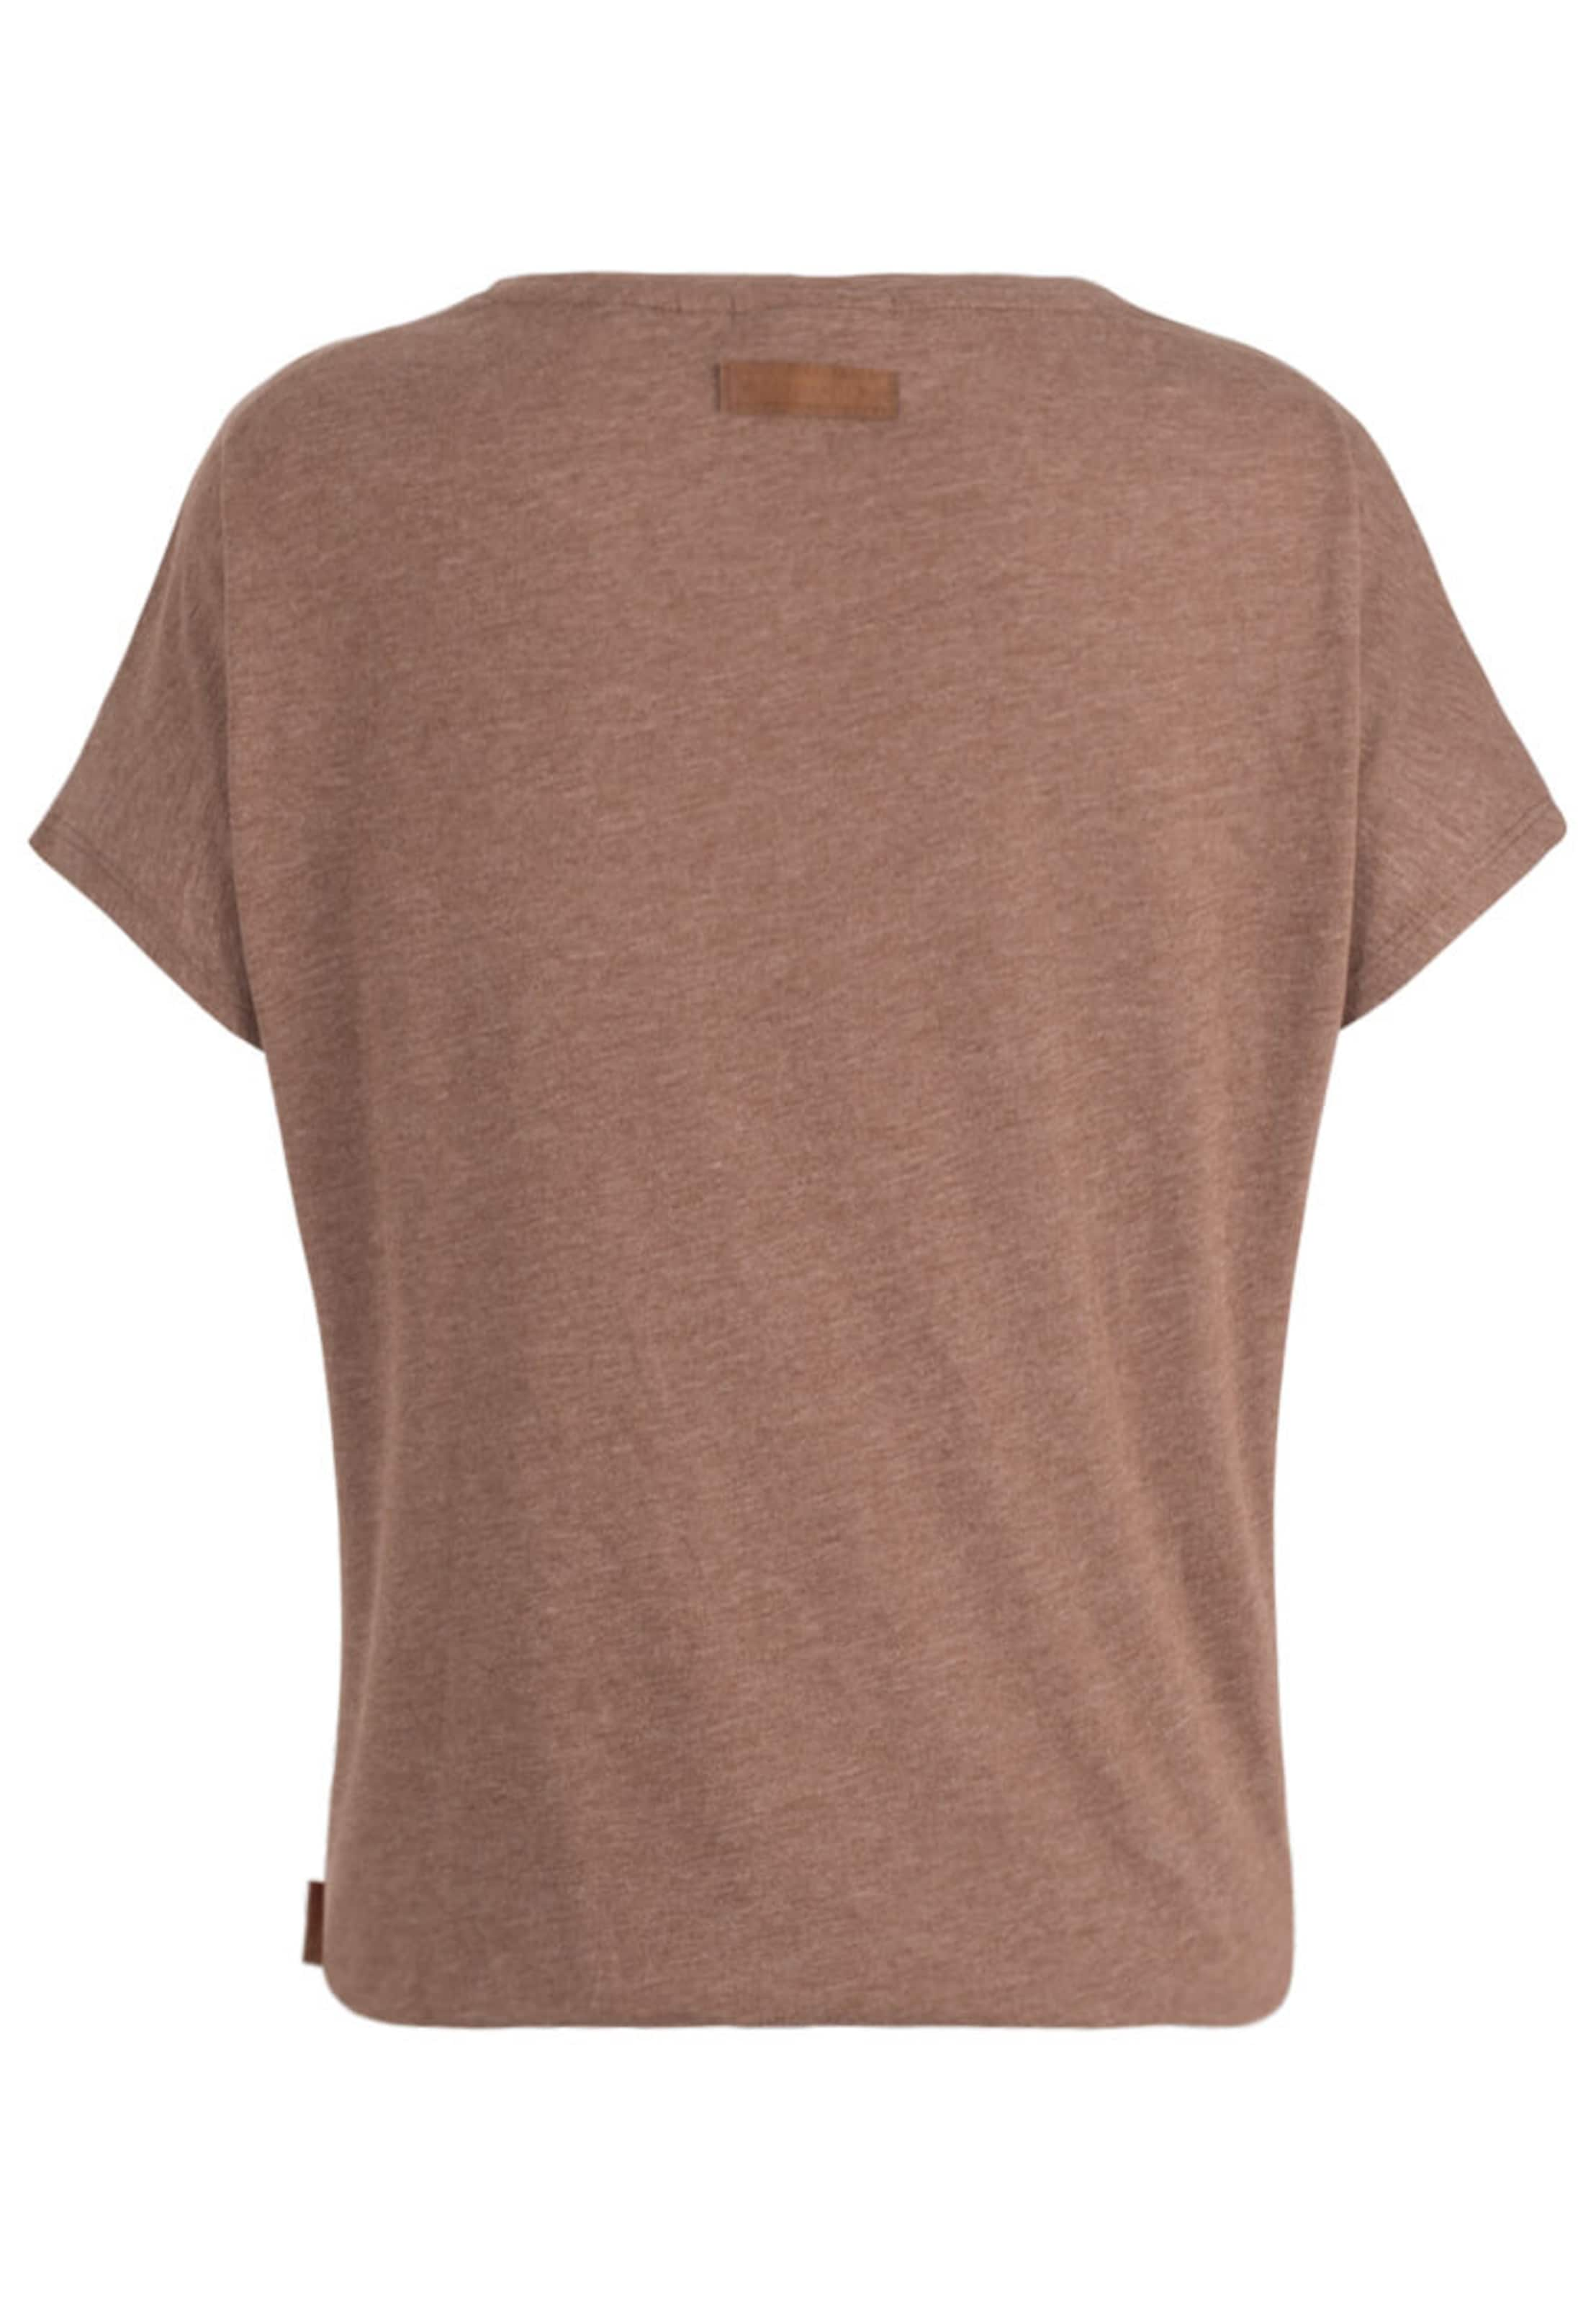 En shirt Baustella' Marron Naketano 'schnella T VUSMqzp